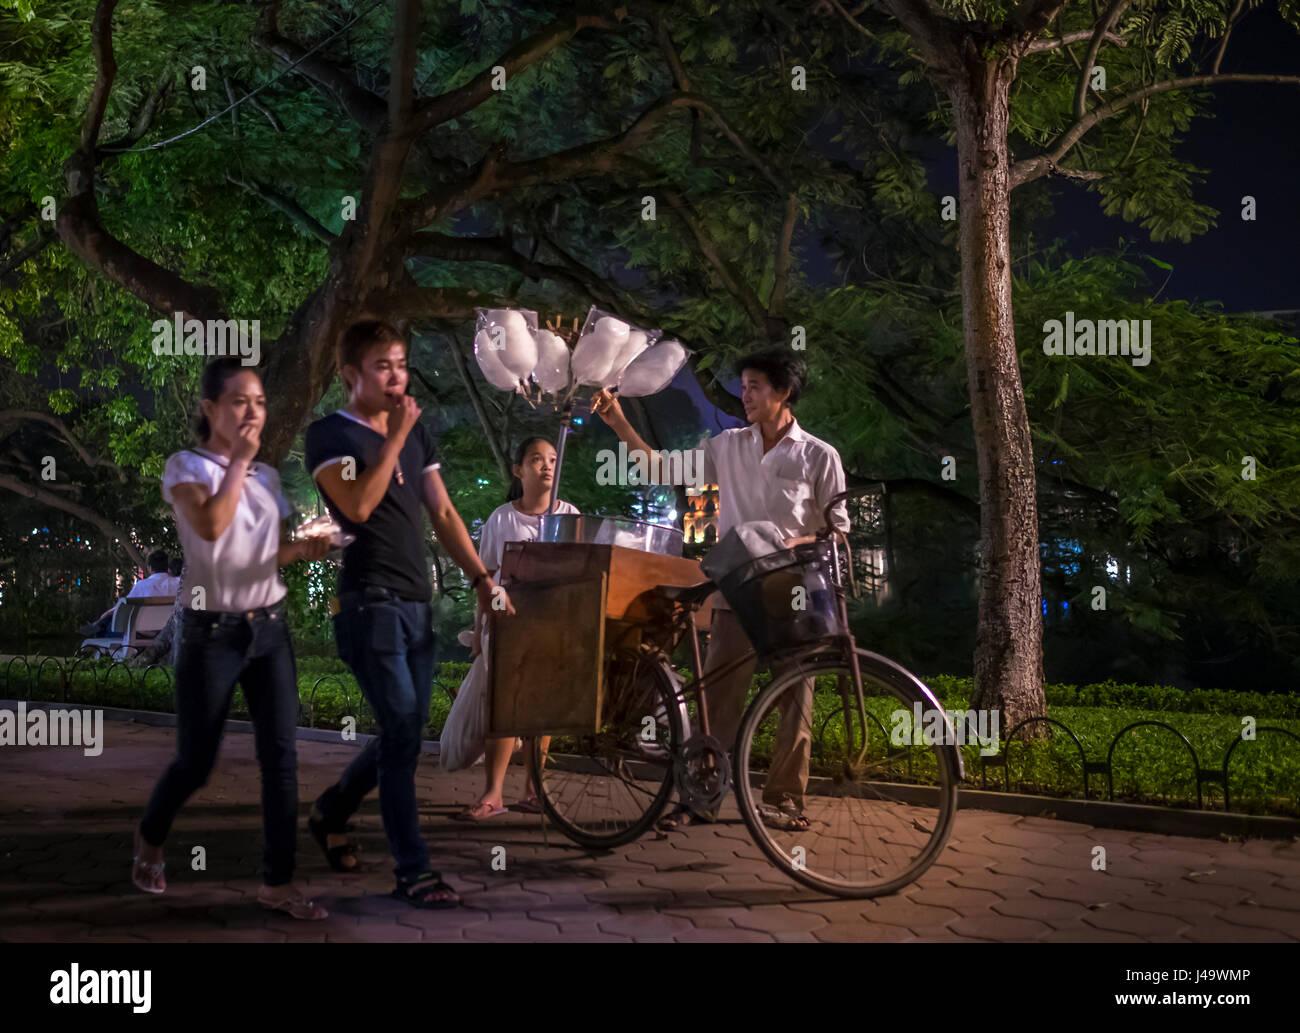 HANOI, VIETNAM - CIRCA SEPTEMBER 2014:  People walking at the Hoan Kiem Lake at night in Hanoi, Vietnam. - Stock Image